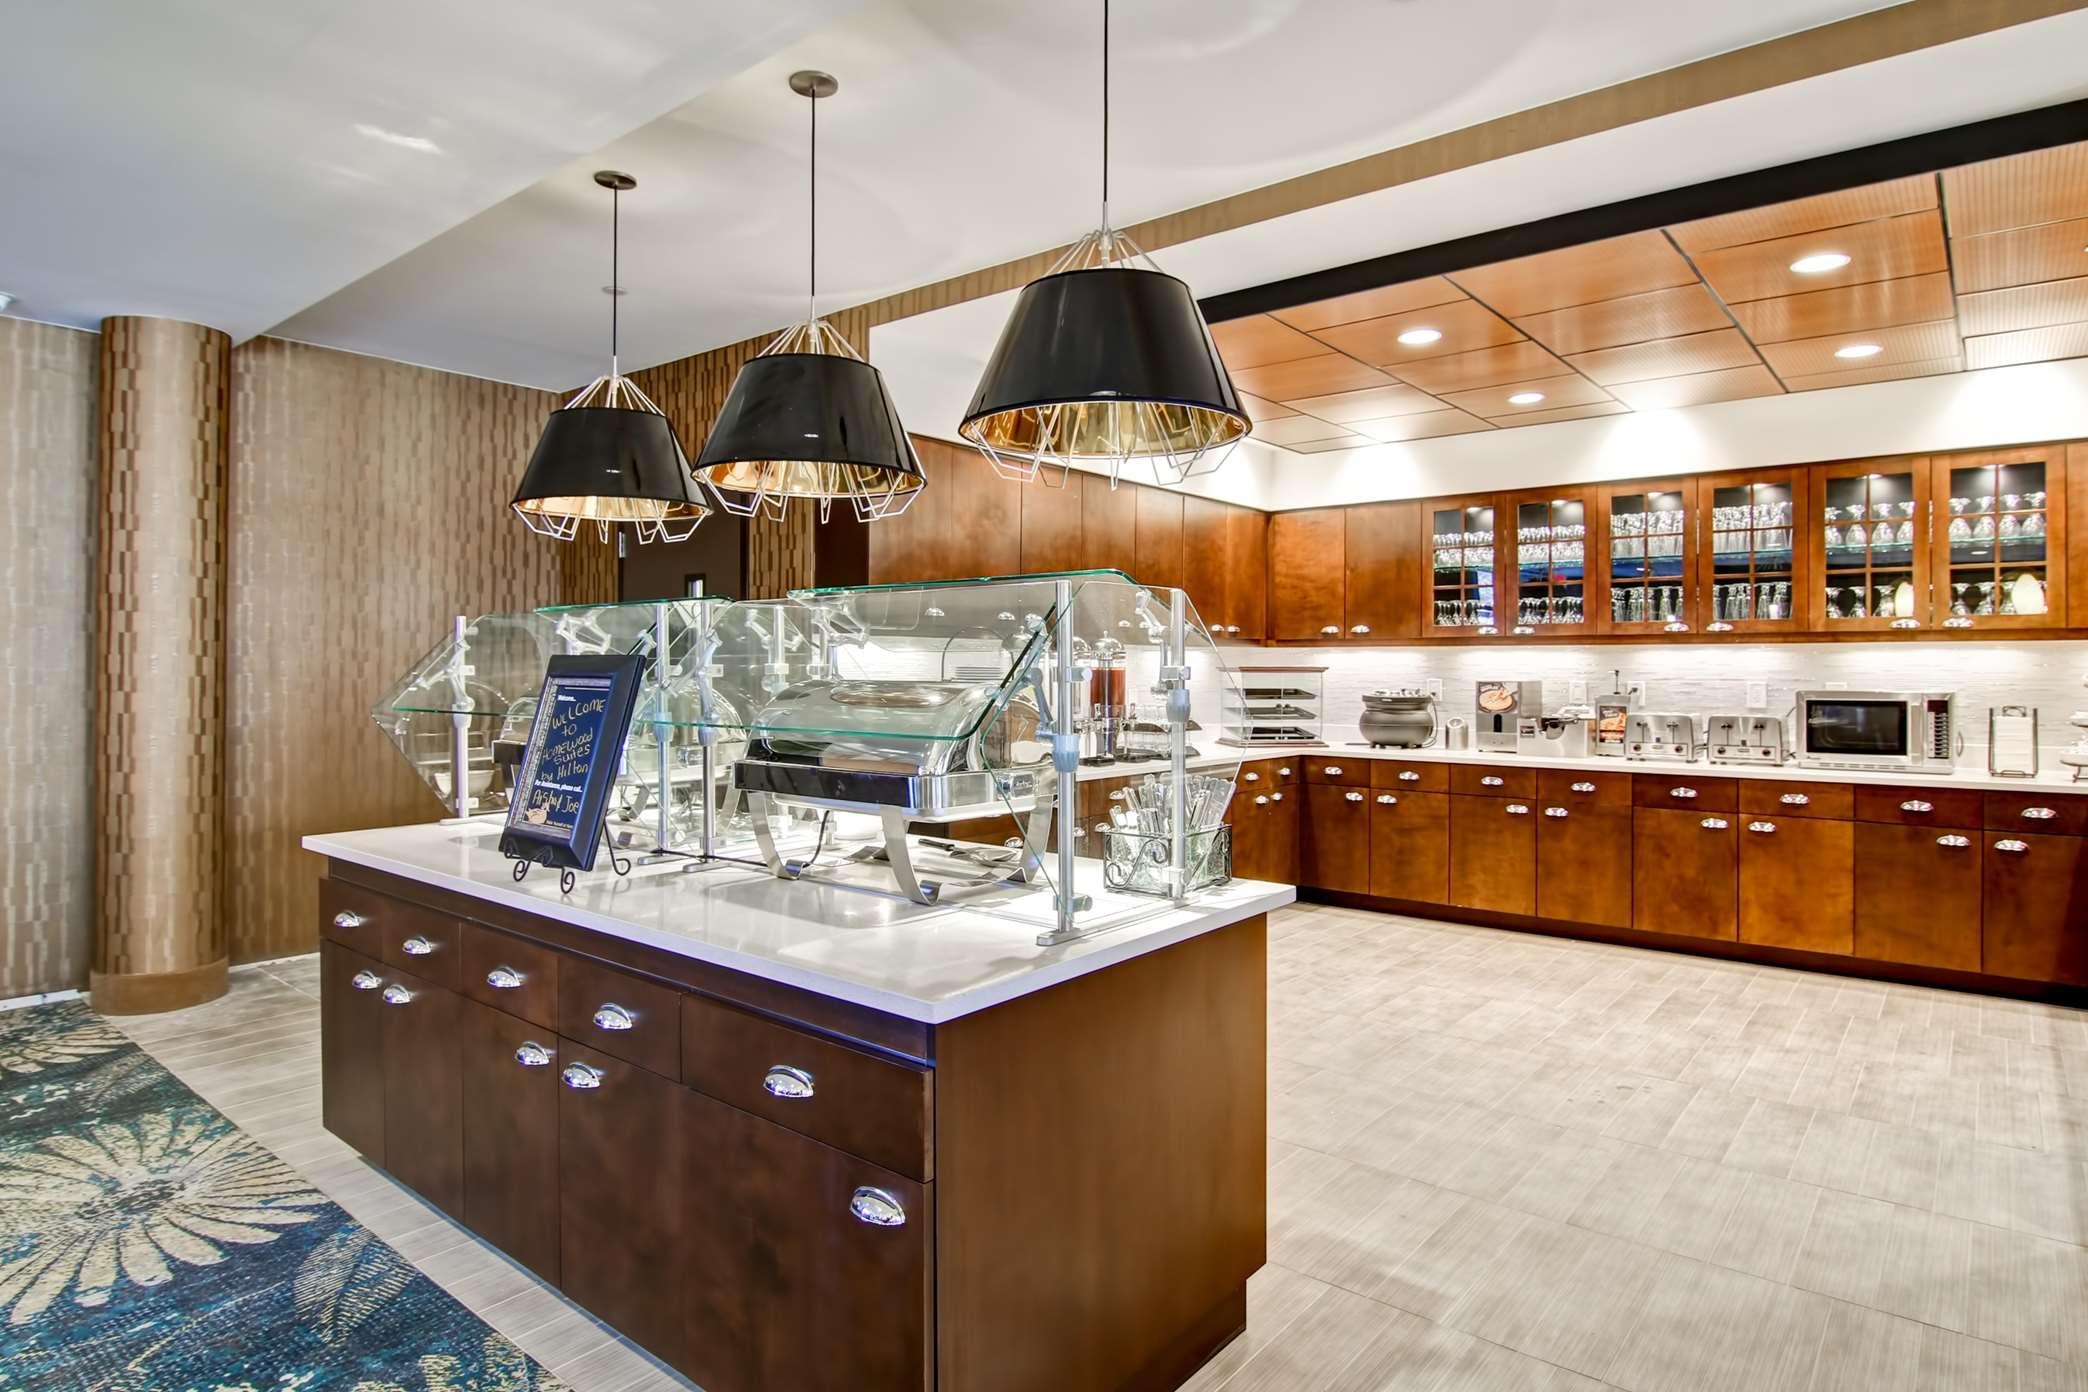 Homewood Suites By Hilton Gaithersburg Washington Dc